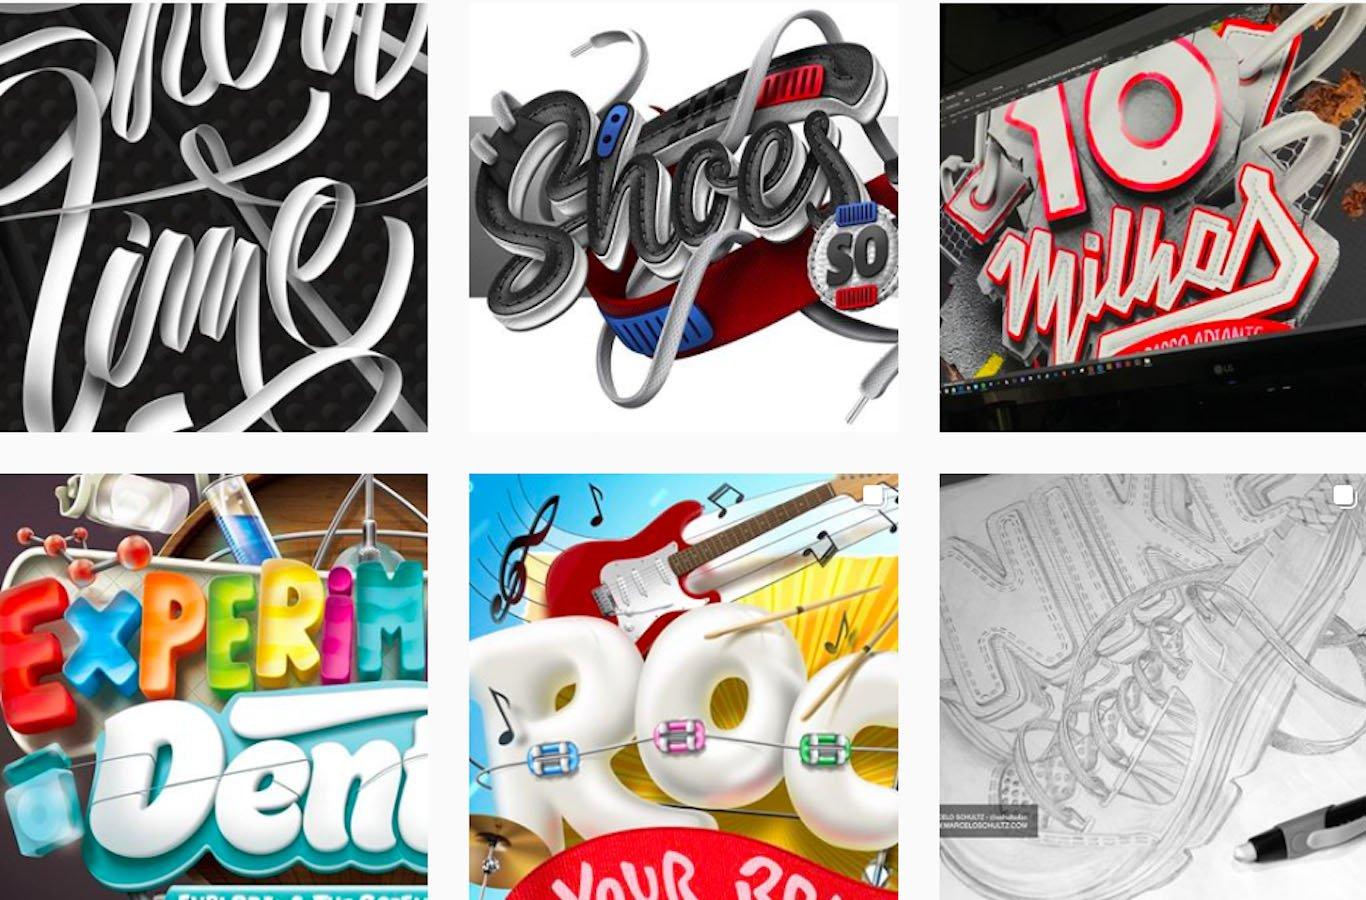 Web Design Inspiration: 110+ Accounts On Instagram and 10+ Best UX & Web Design Books in 2020 - schultzdzn